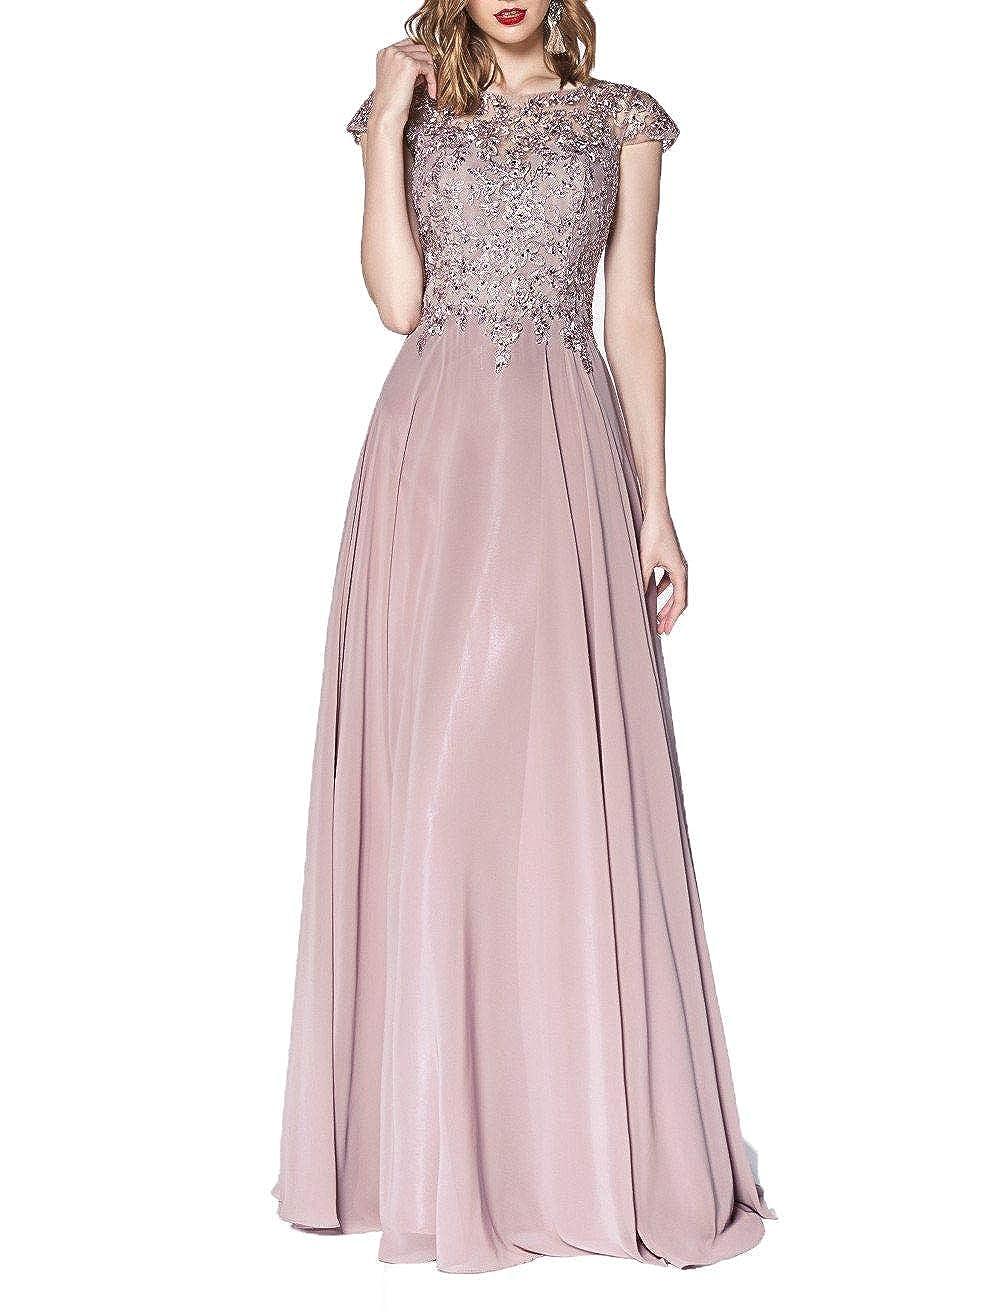 bluesh Wanshaqin Women's Illusion Neckline Jeweled Waist Long Evening Gown Prom Formal Dress Bridesmaid Gown